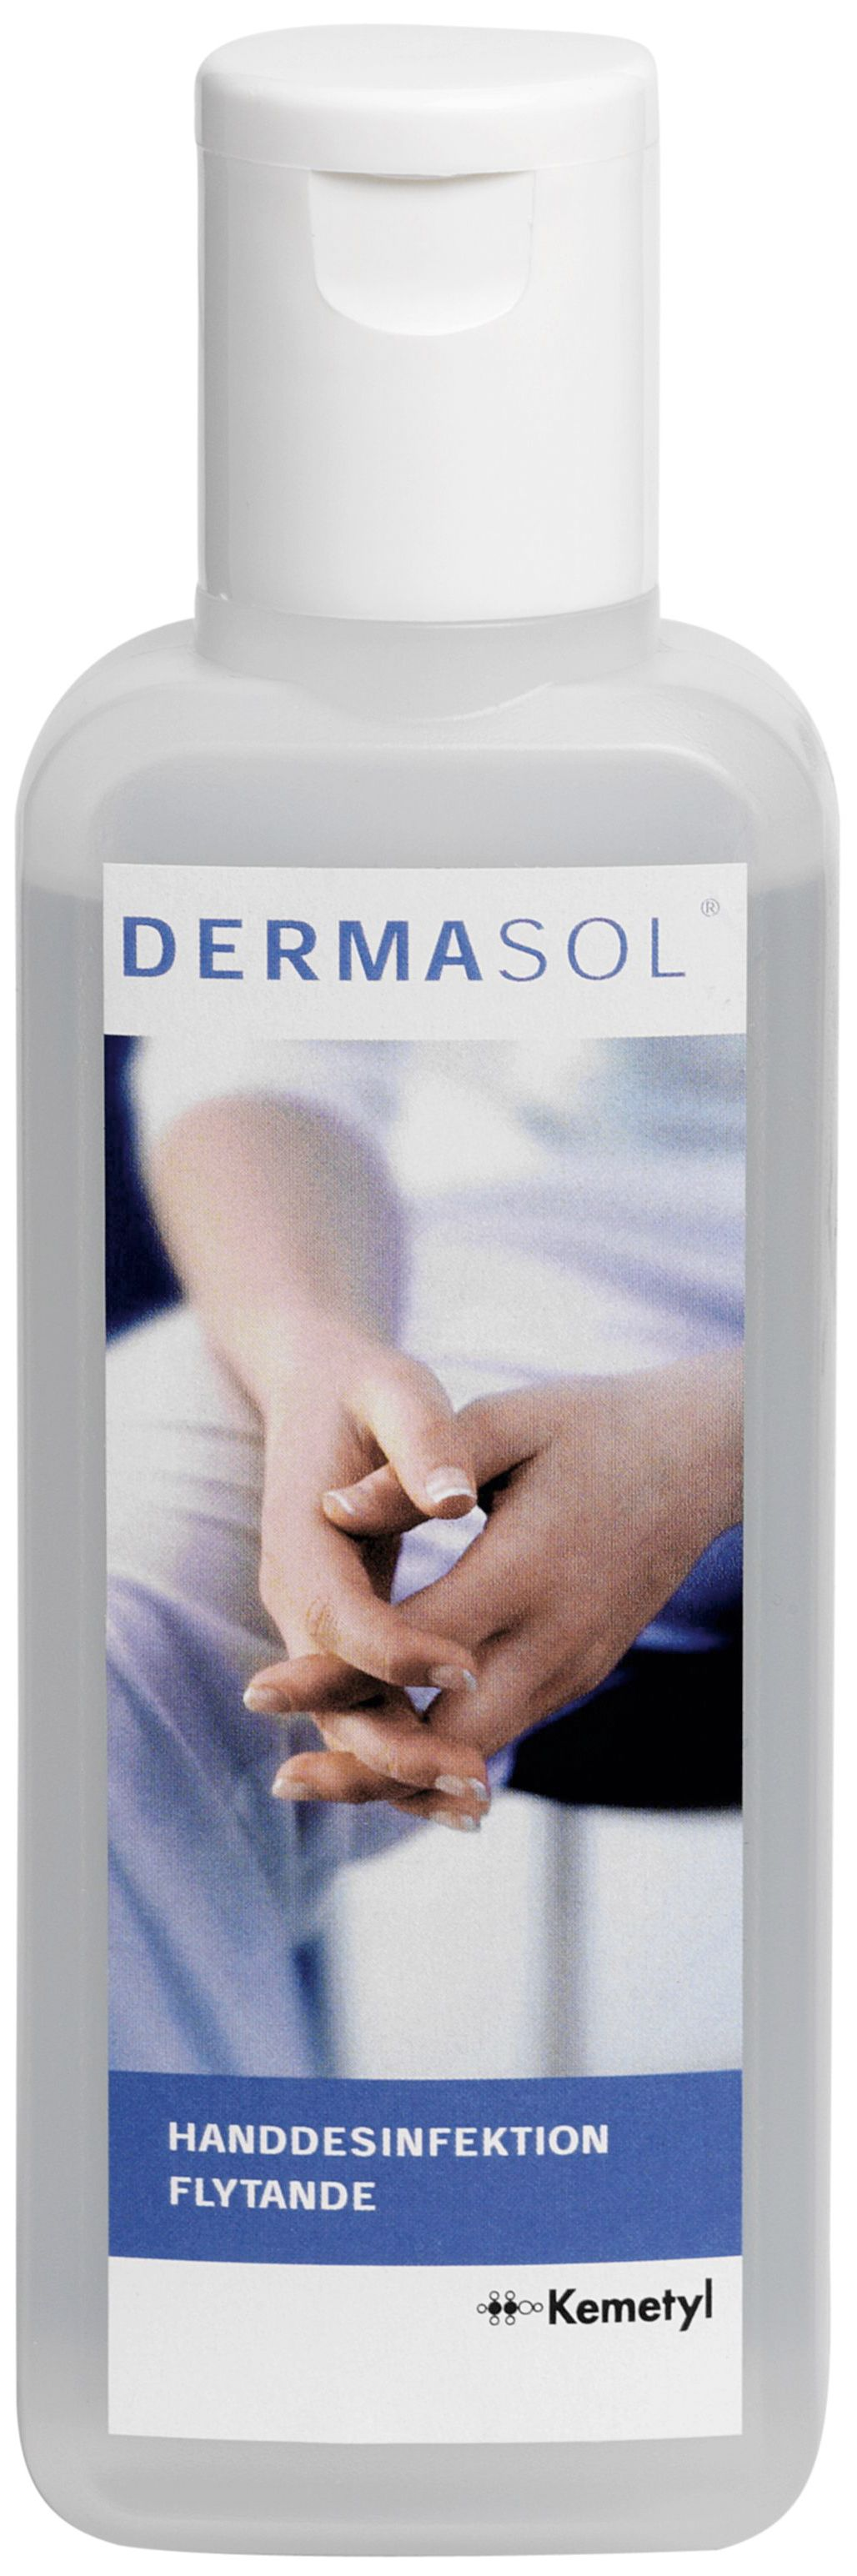 Hånddesinfeksjon ANTIBAC Dermasol 150ml Y490412